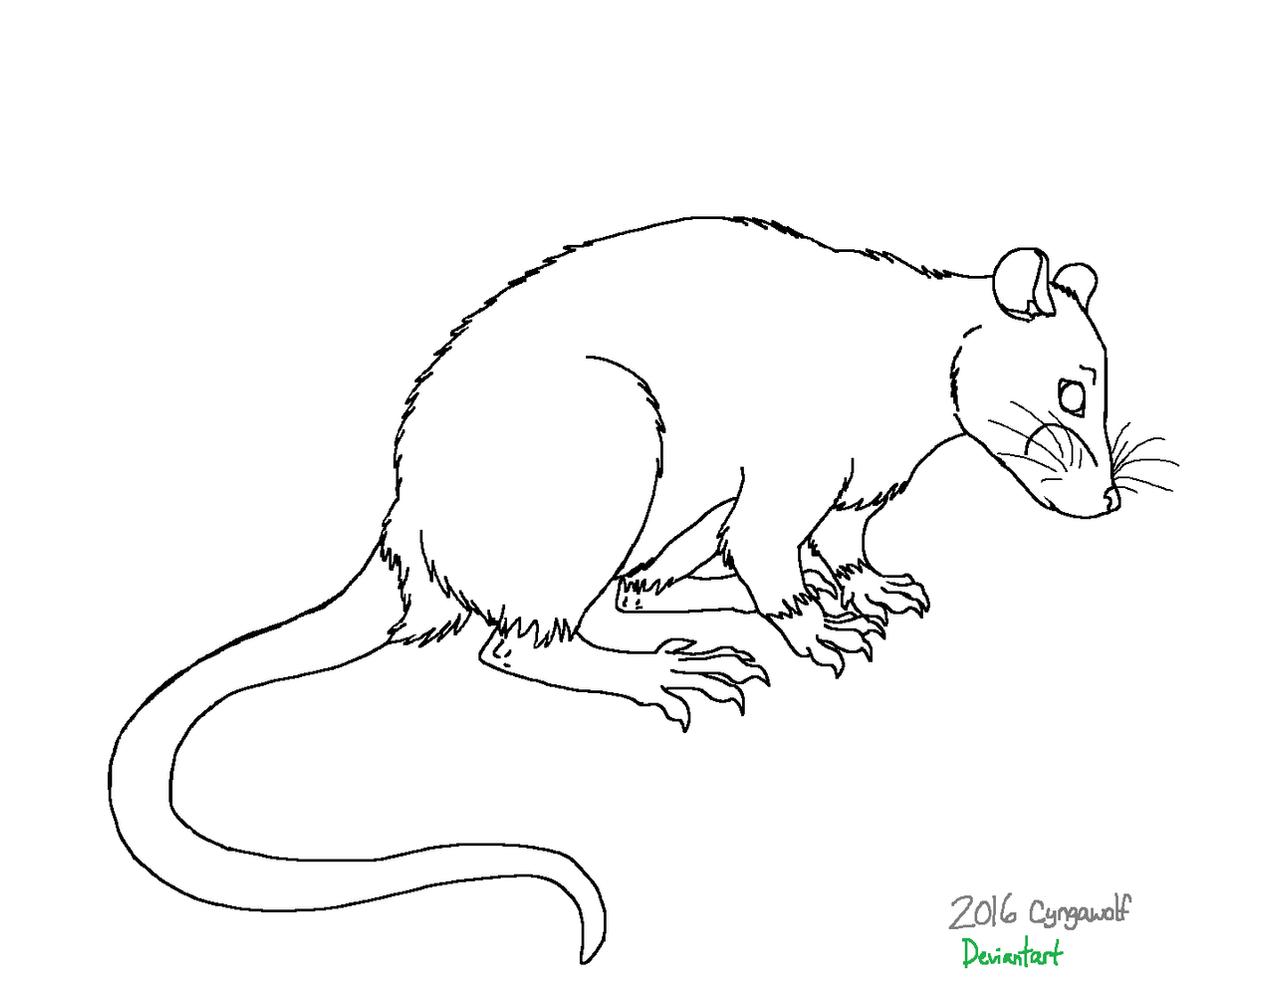 Line Art Rat : Rat lineart remaster by cyngawolf on deviantart